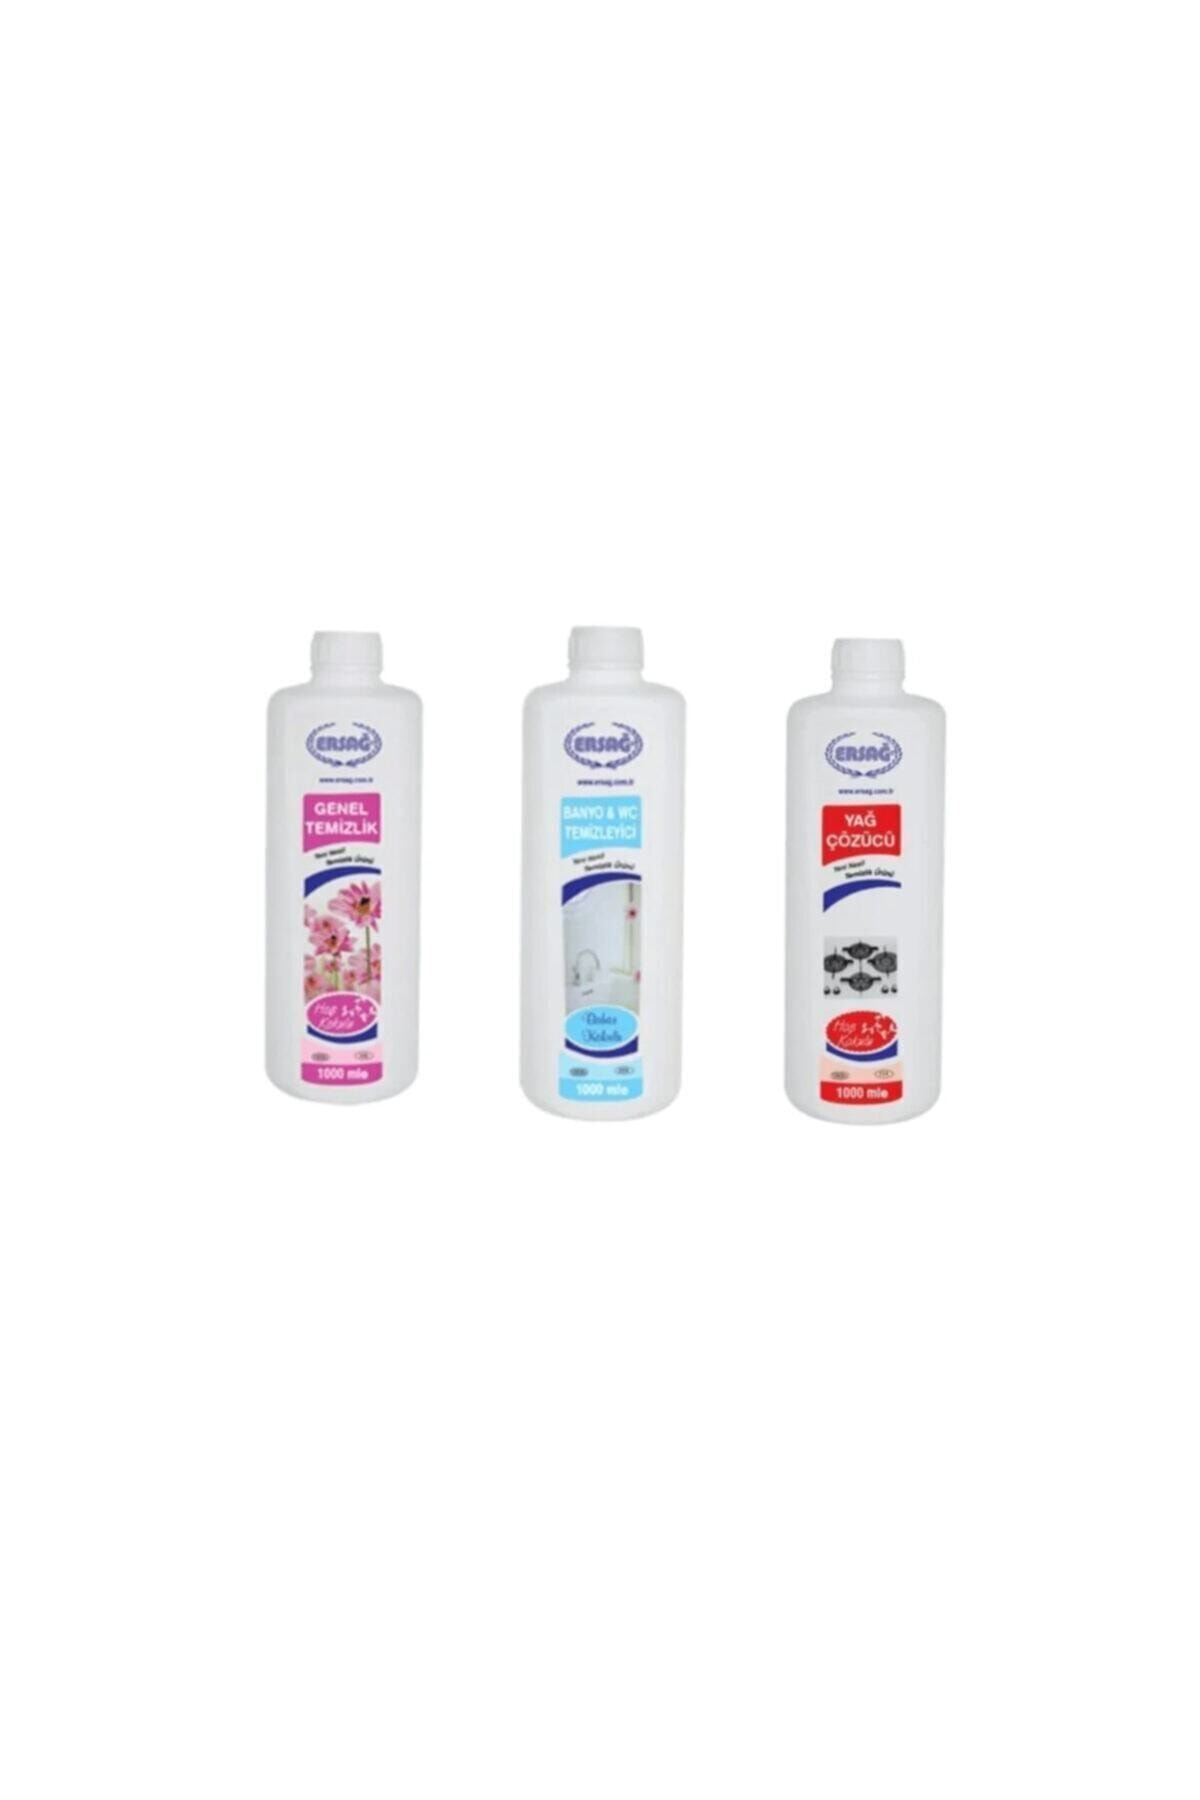 Ersağ Genel Temizlik + Bahar Kokulu Banyo Wc + Yag Çöz 3 Adet * 1000 ml 1